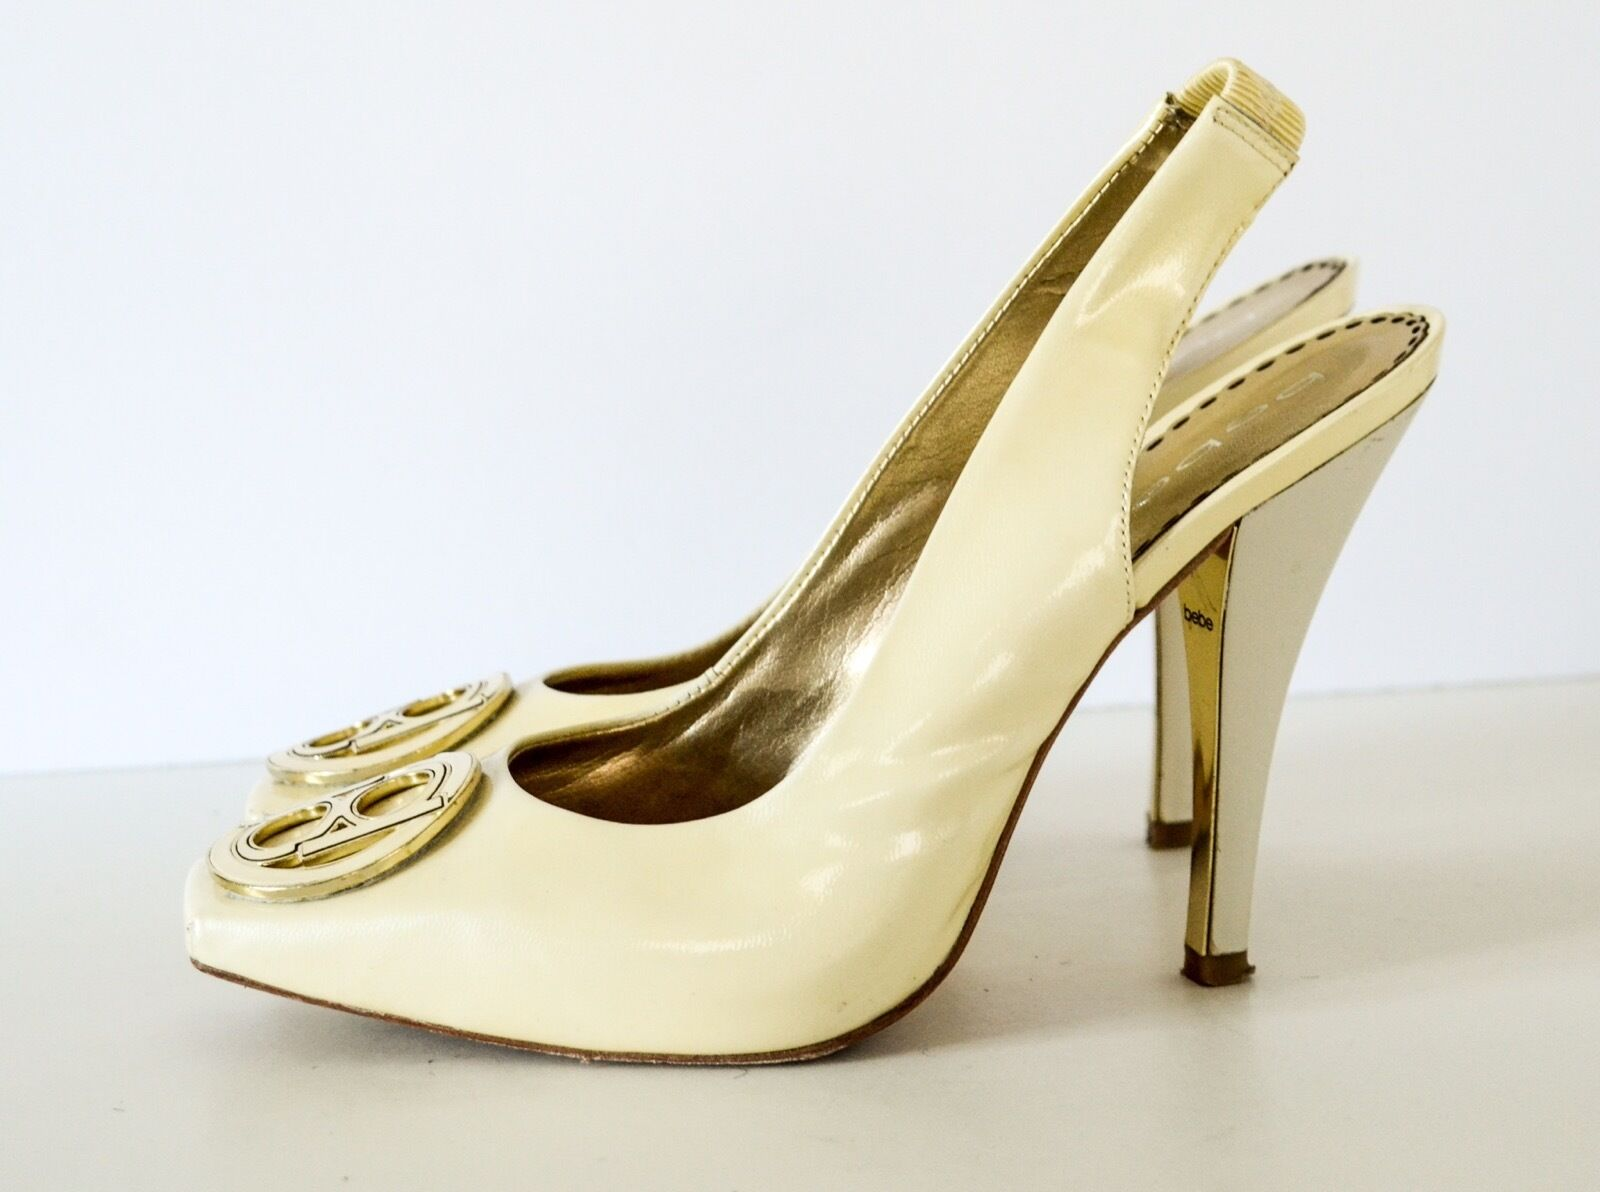 Bebe Yellow Patent leather Square Toe Slingback pumps 7B